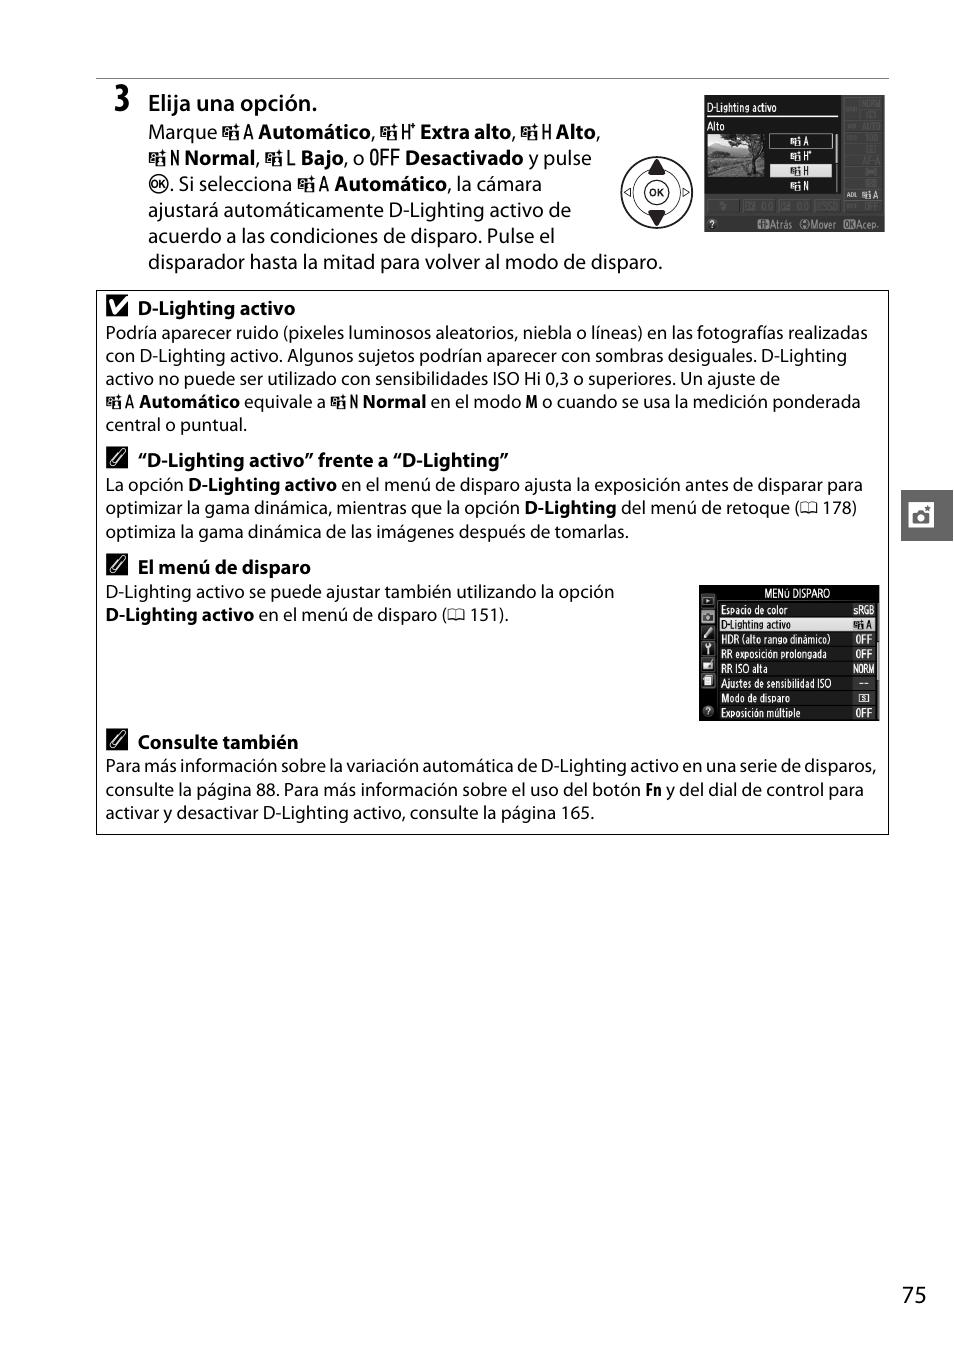 nikon d5100 manual del usuario p gina 93 260 original rh pdfmanuales com Shot with Nikon D5100 Diagram Nikon D5100